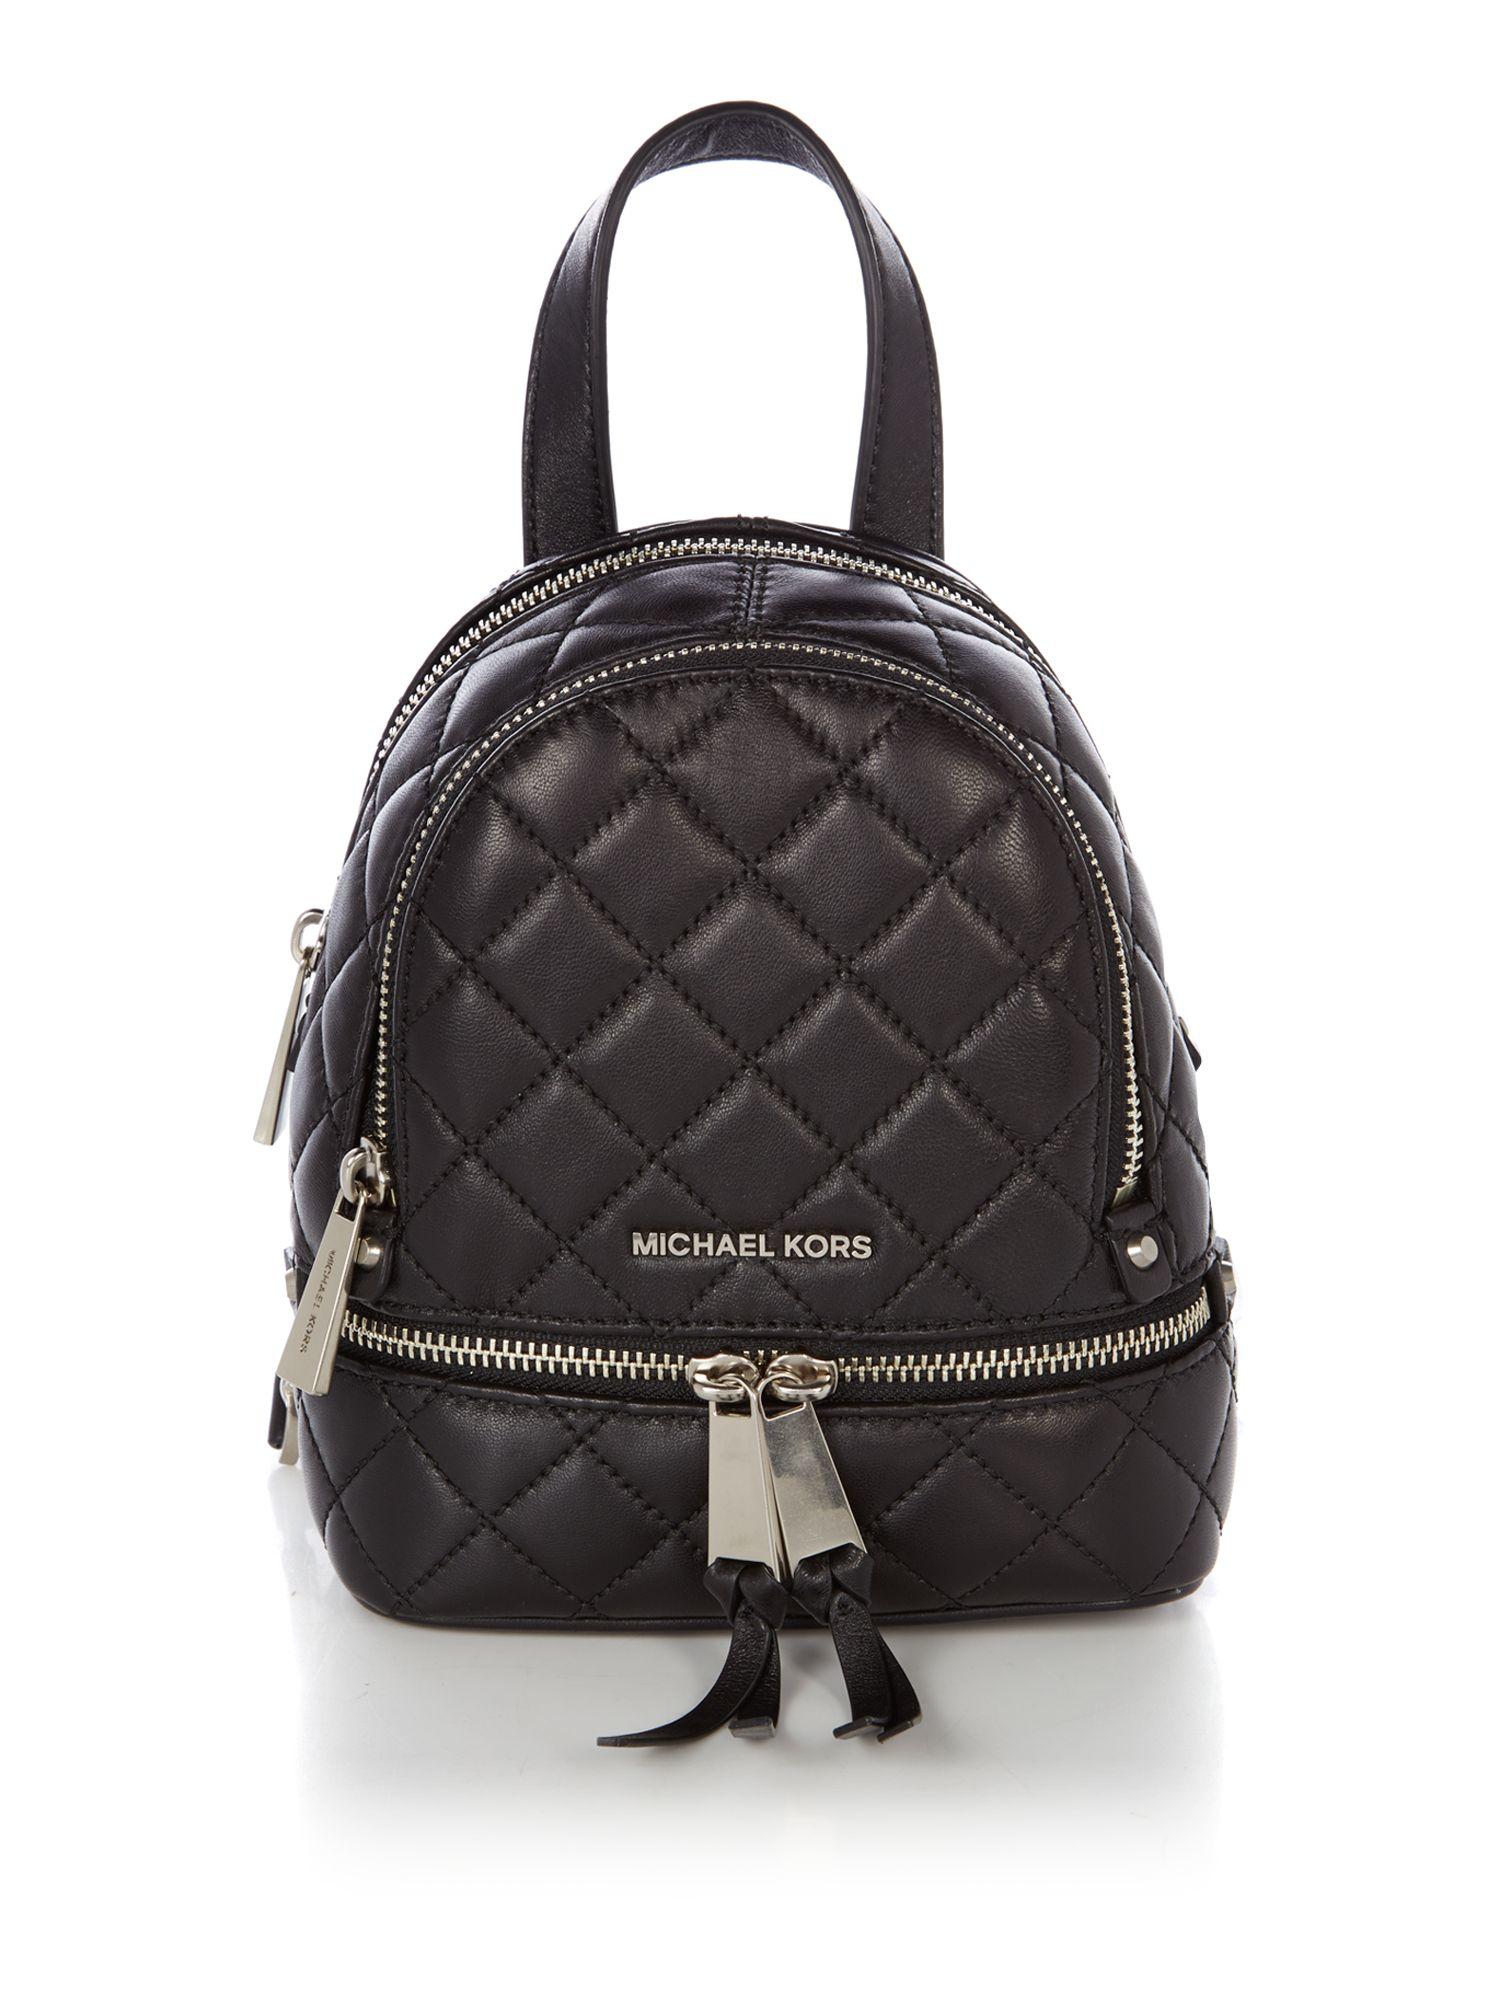 michael kors rhea zip medium backpack in black lyst. Black Bedroom Furniture Sets. Home Design Ideas